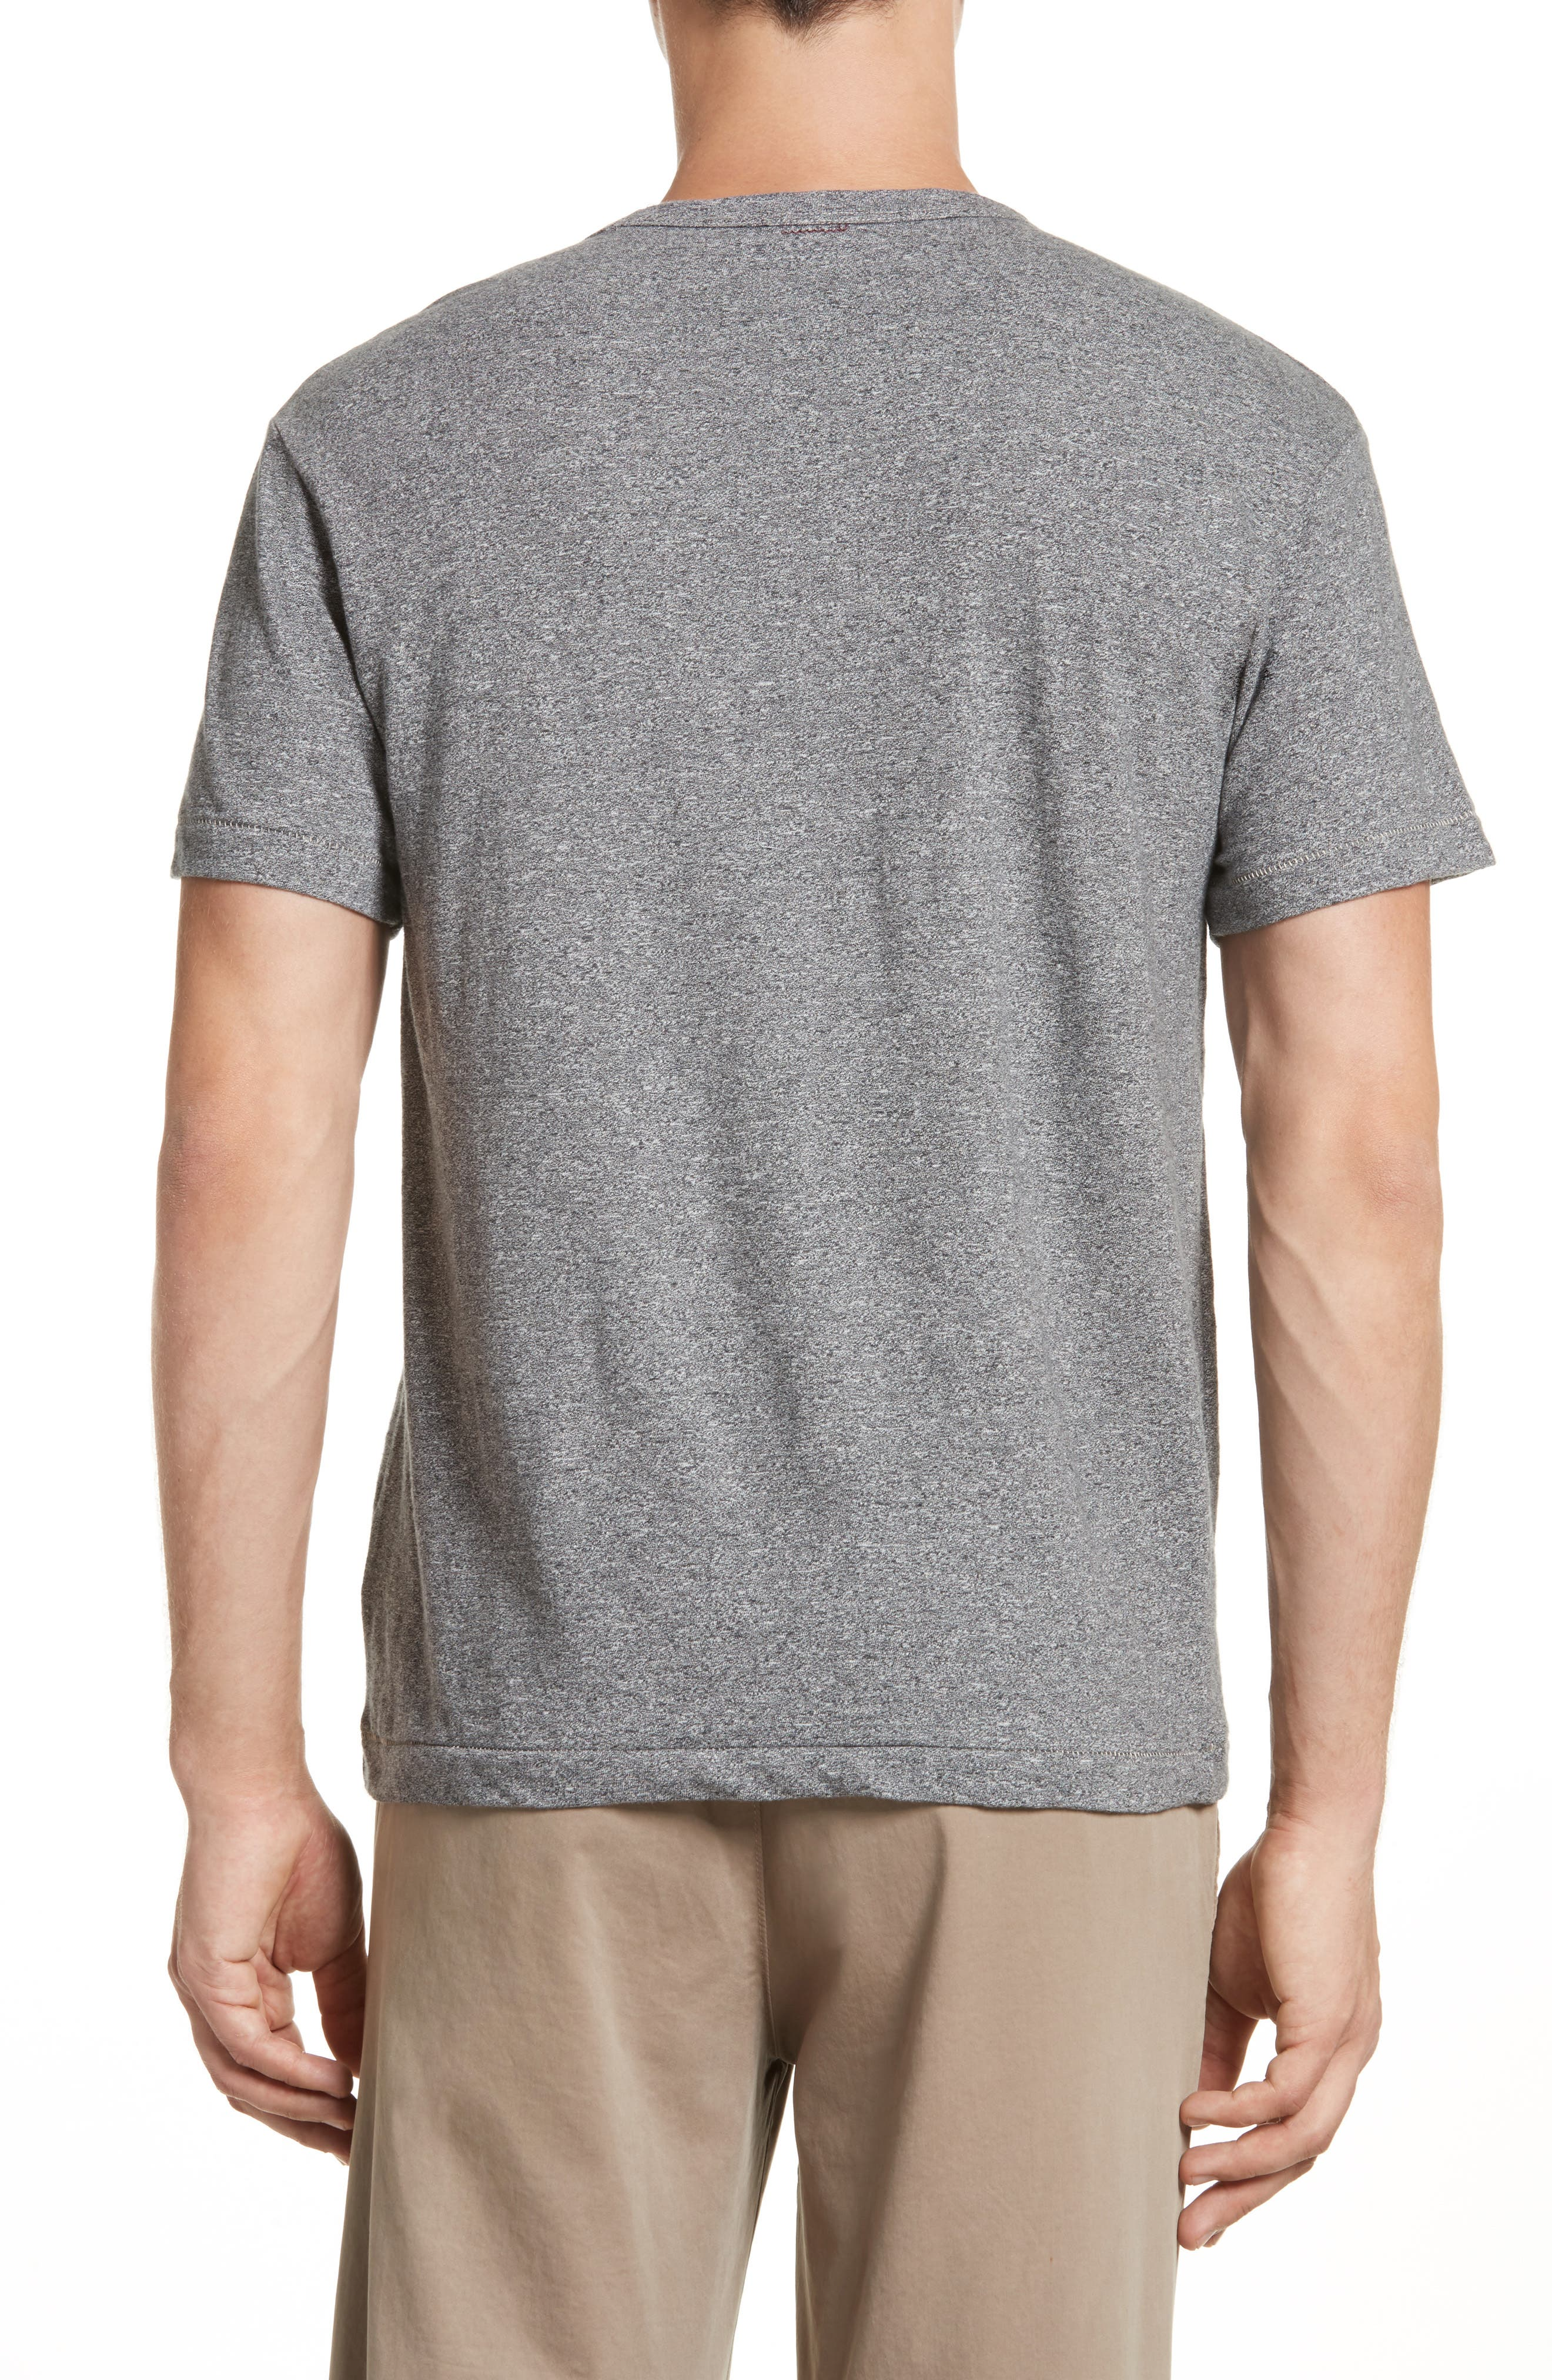 Alternate Image 2  - Todd Snyder + Champion Heathered Crewneck T-Shirt